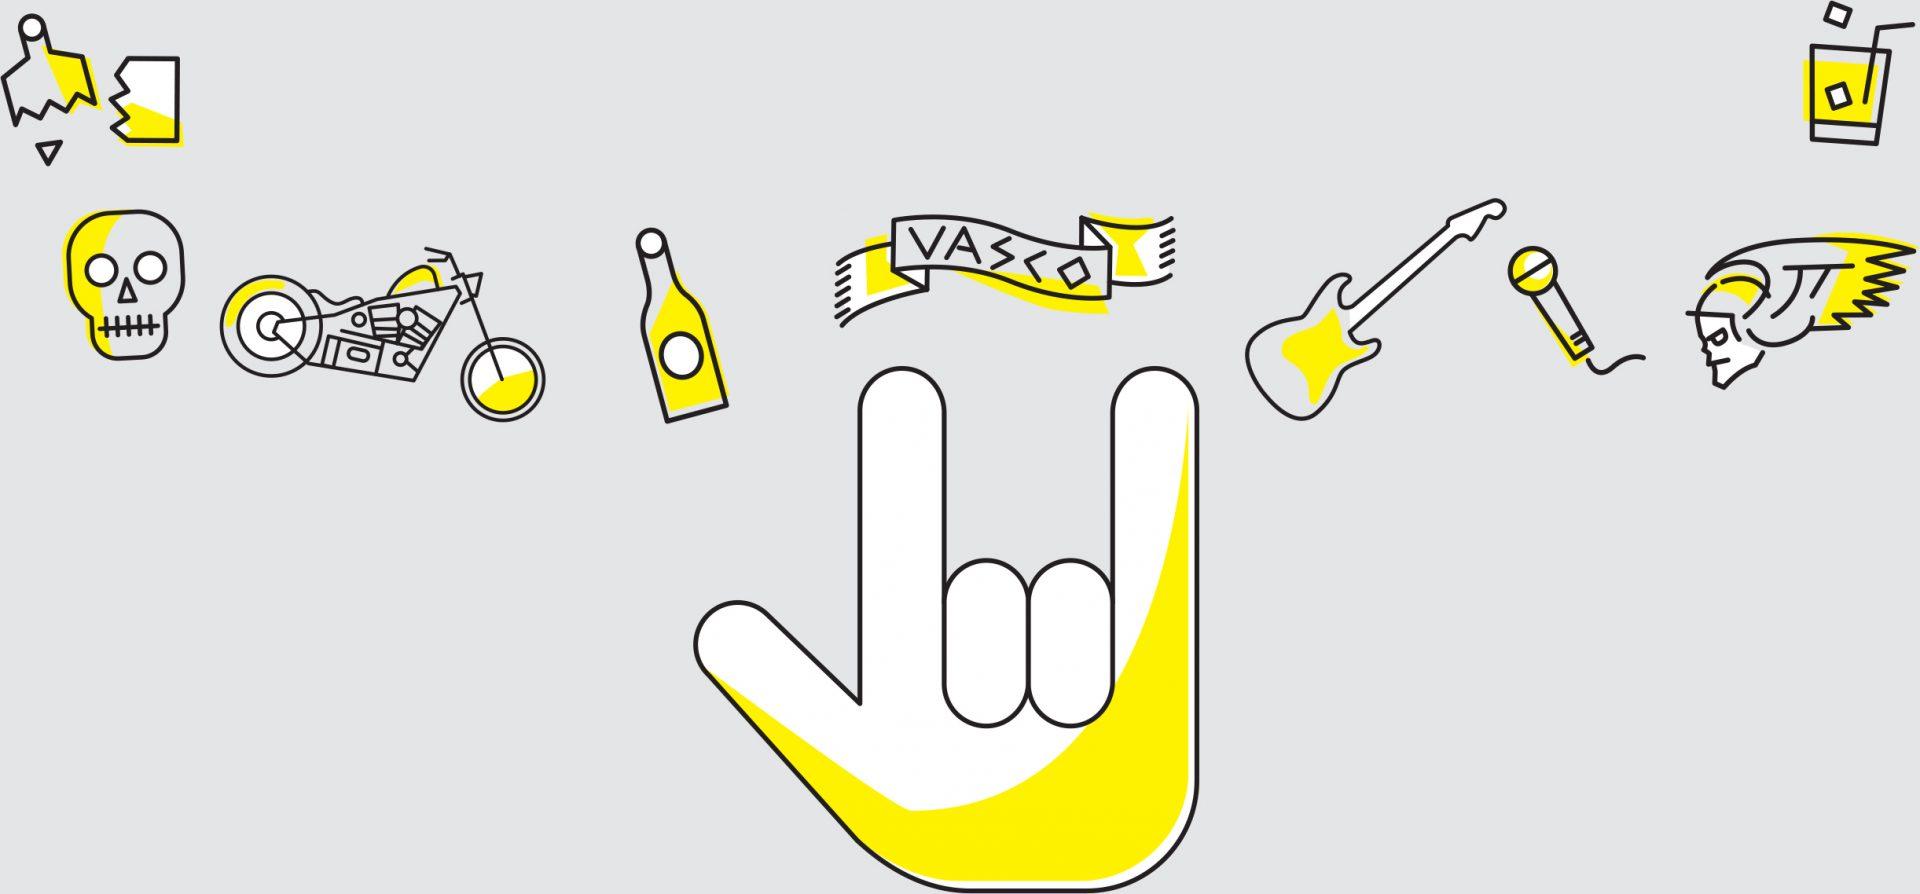 rock politica vasco